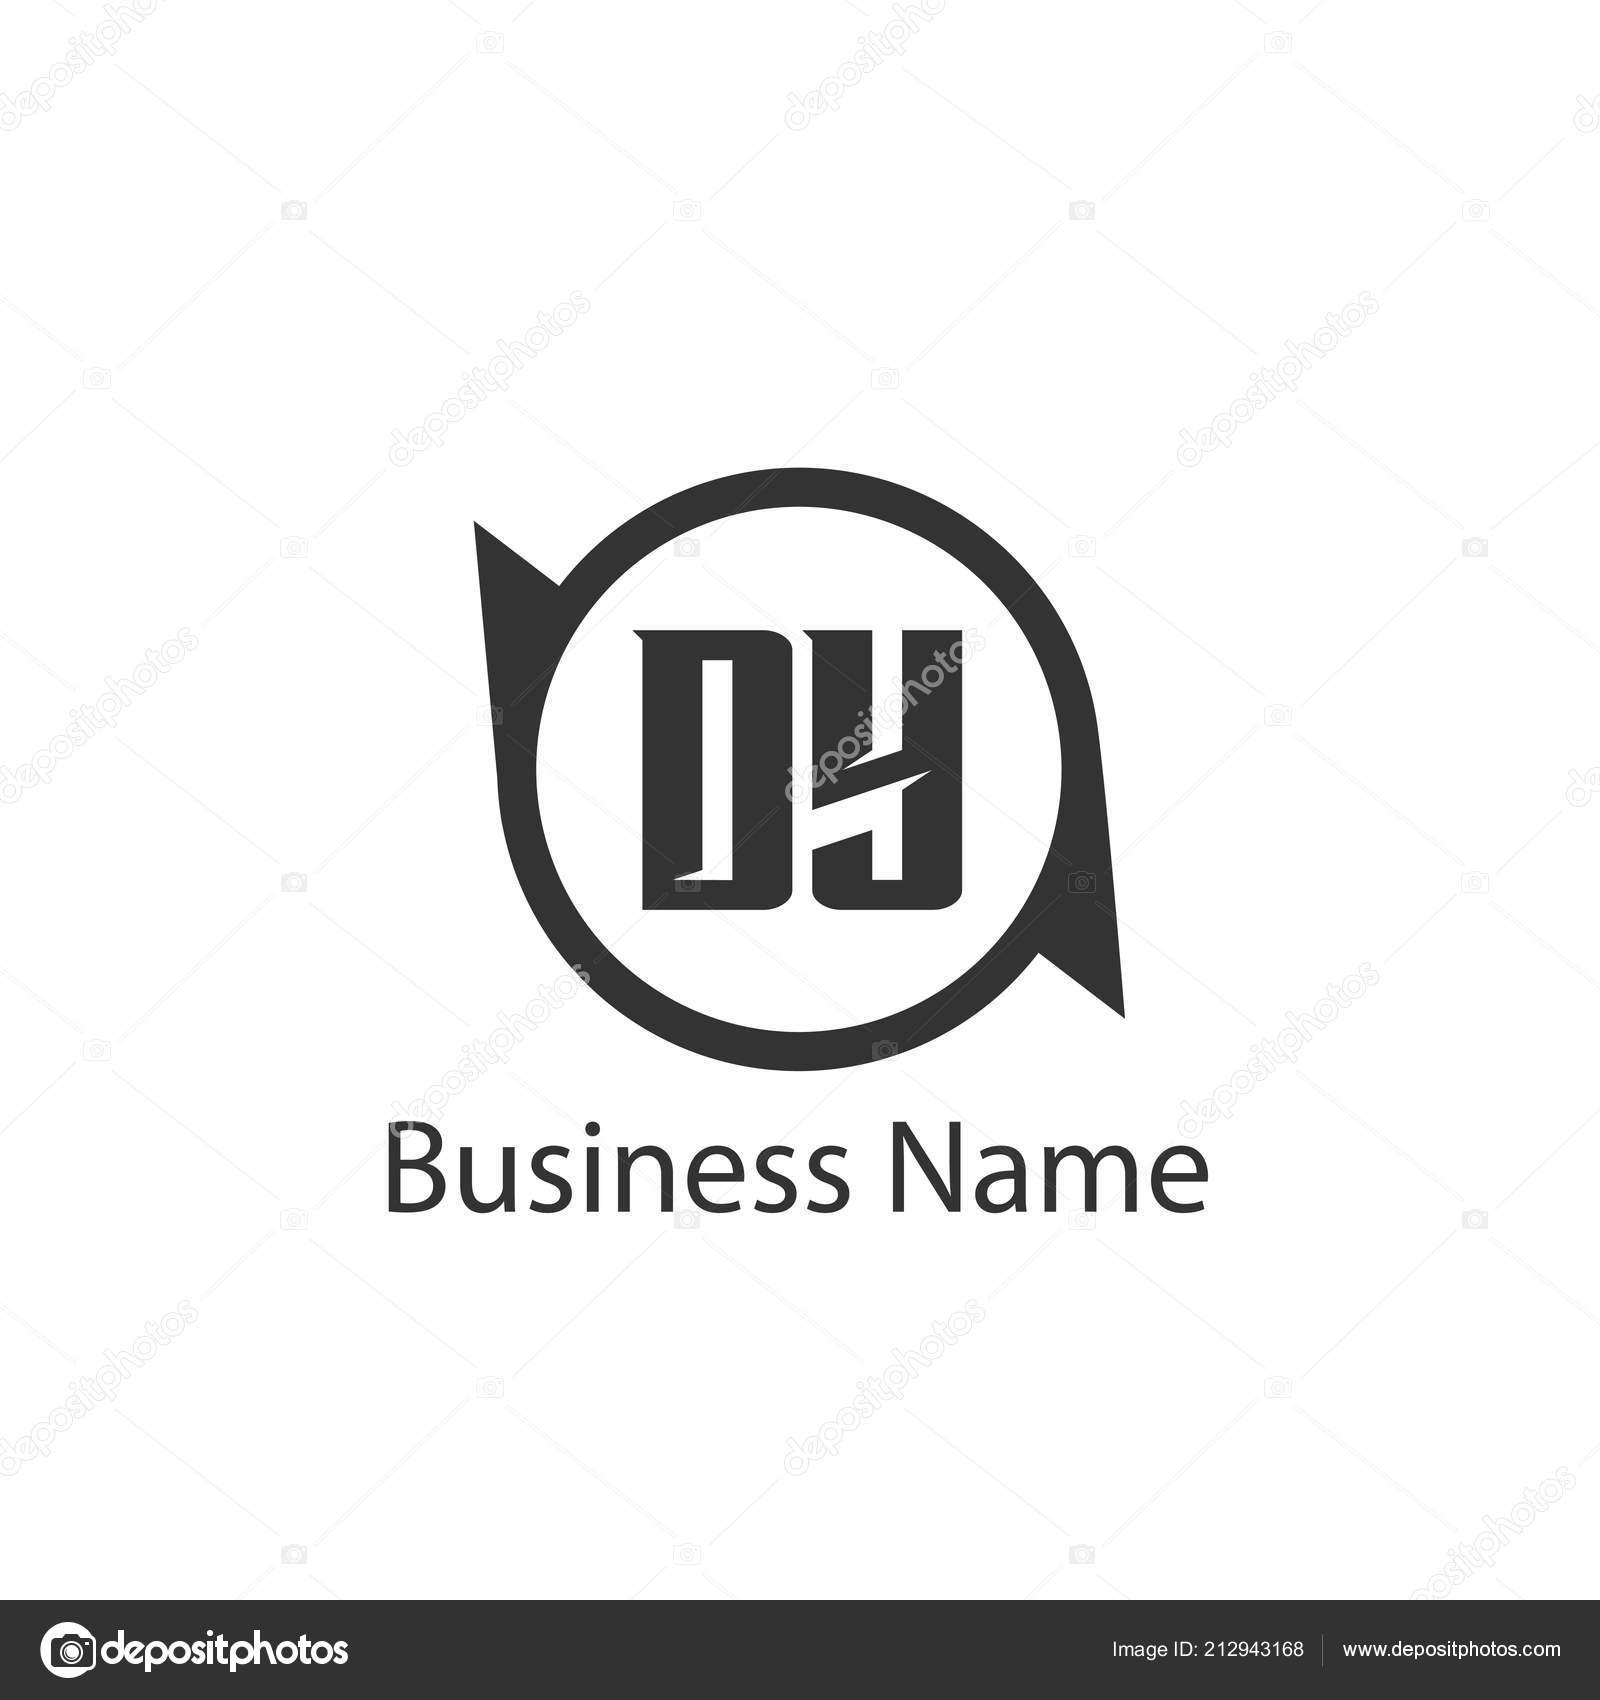 Lettre Initiale Conception Modele Logo Image Vectorielle Mohammad Muhtadi14 Gmail Com C 212943168